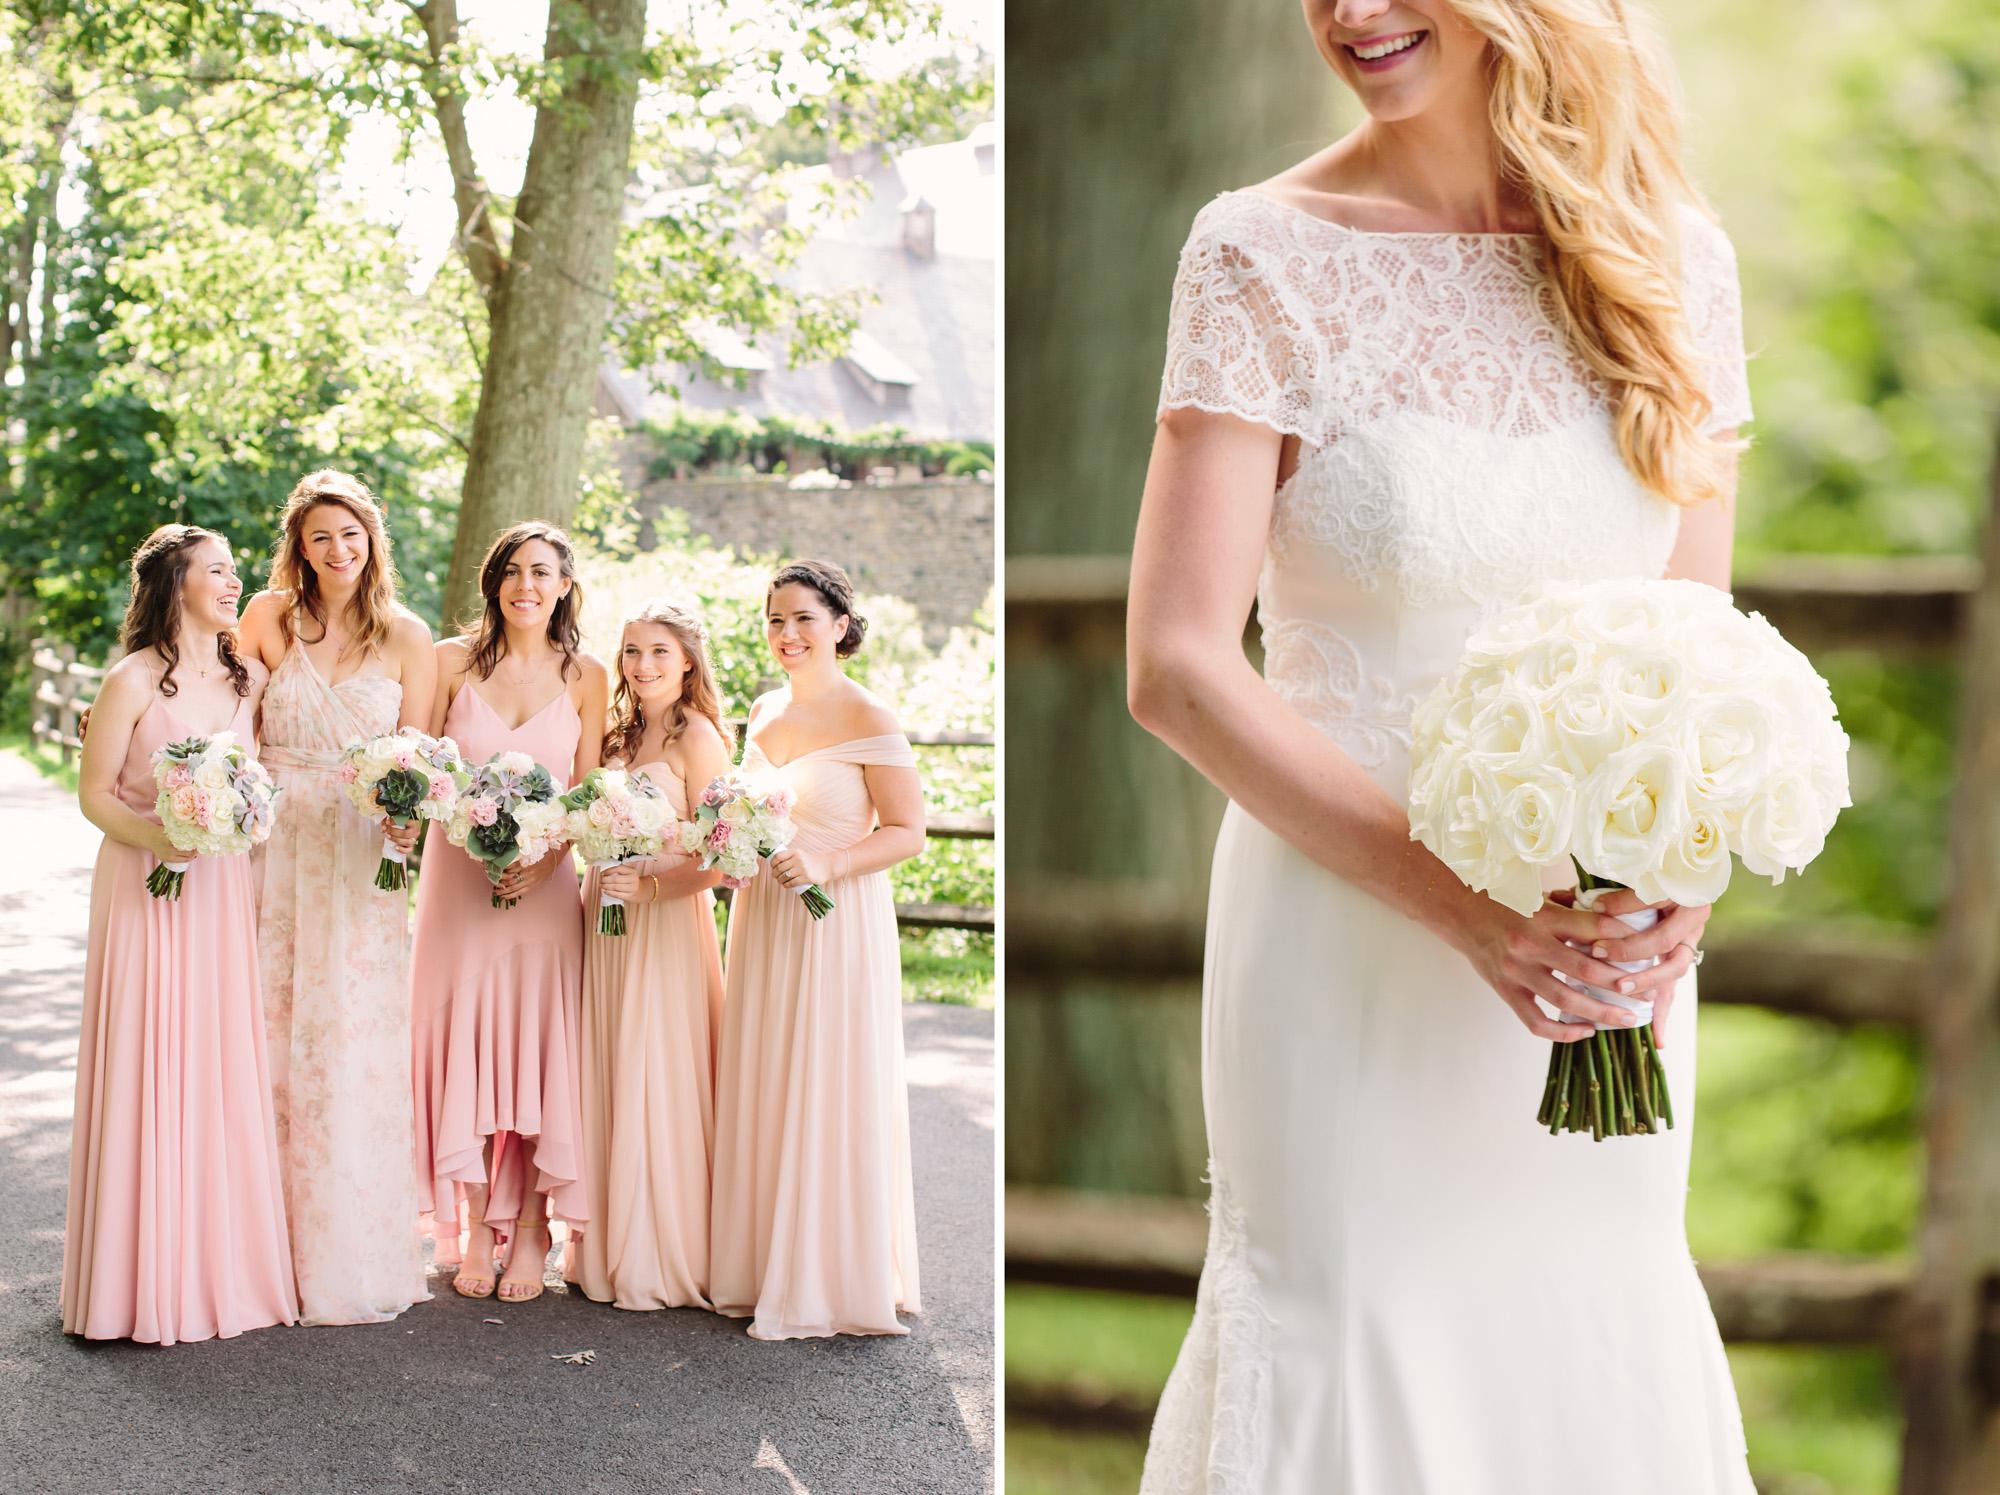 29_Jessica_Ted_Blue_Hill_Stone_Barns_Wedding_Pocantico_NY_Tanya_Salazar_Photography.jpg